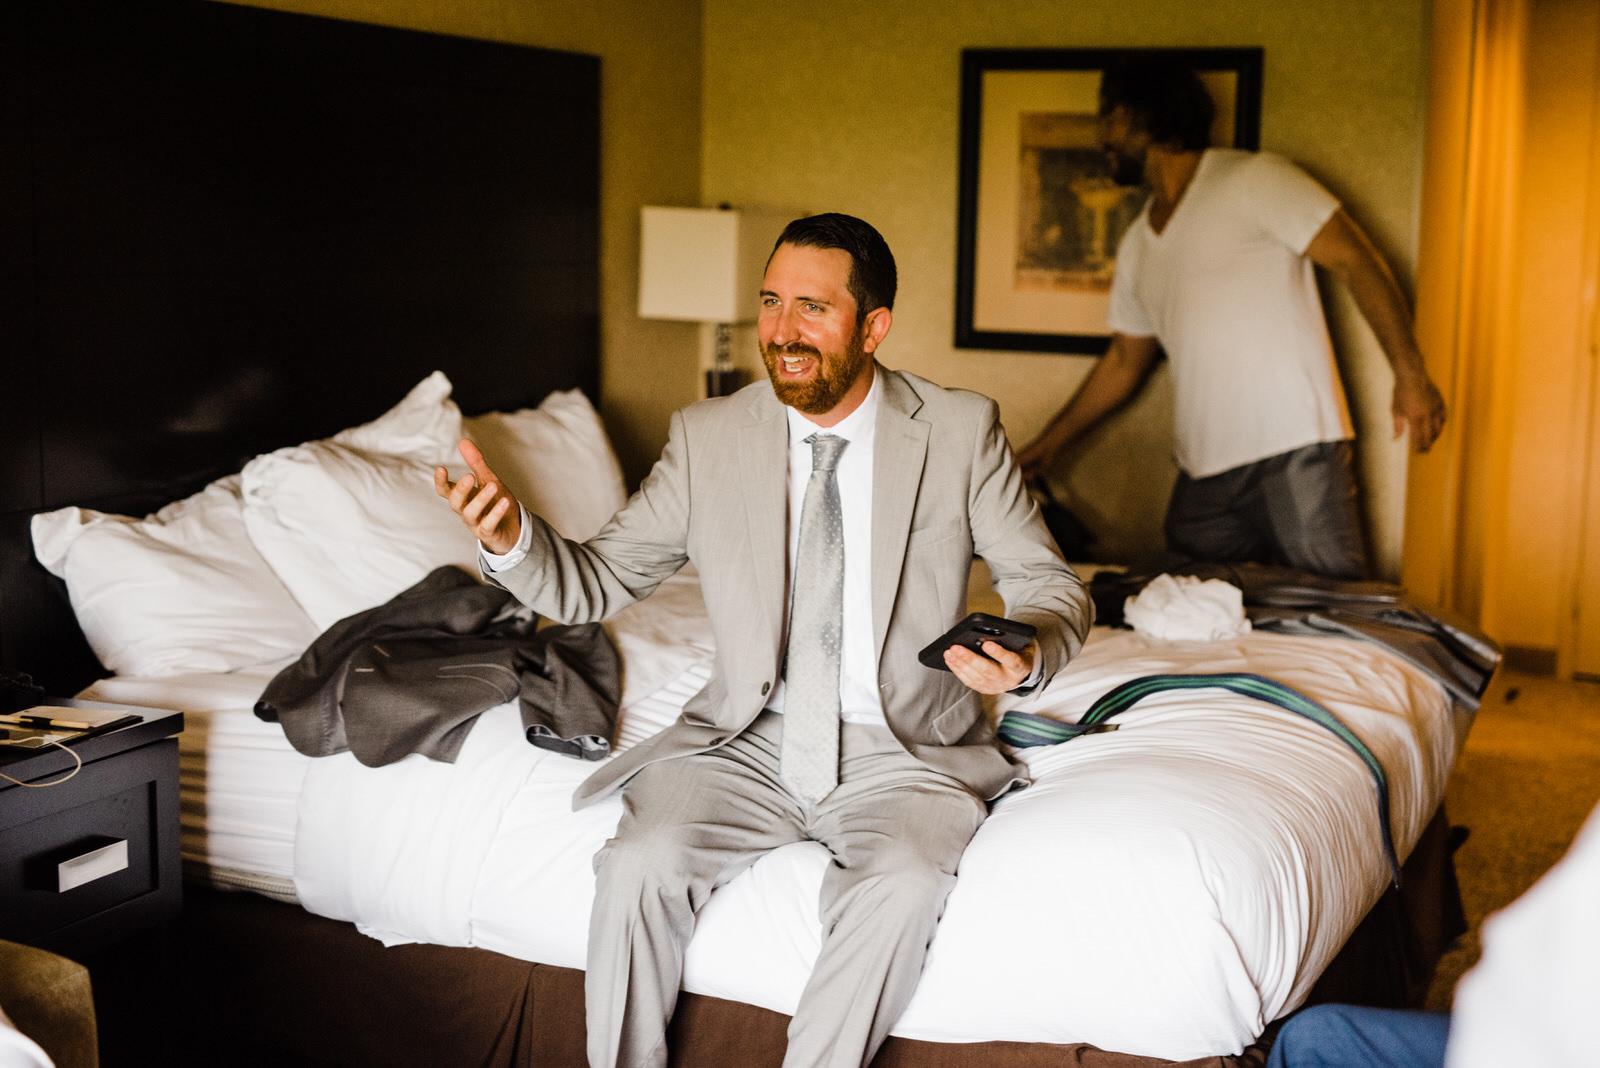 Groomsmen in hotel room getting ready | Roswell River Landing Wedding